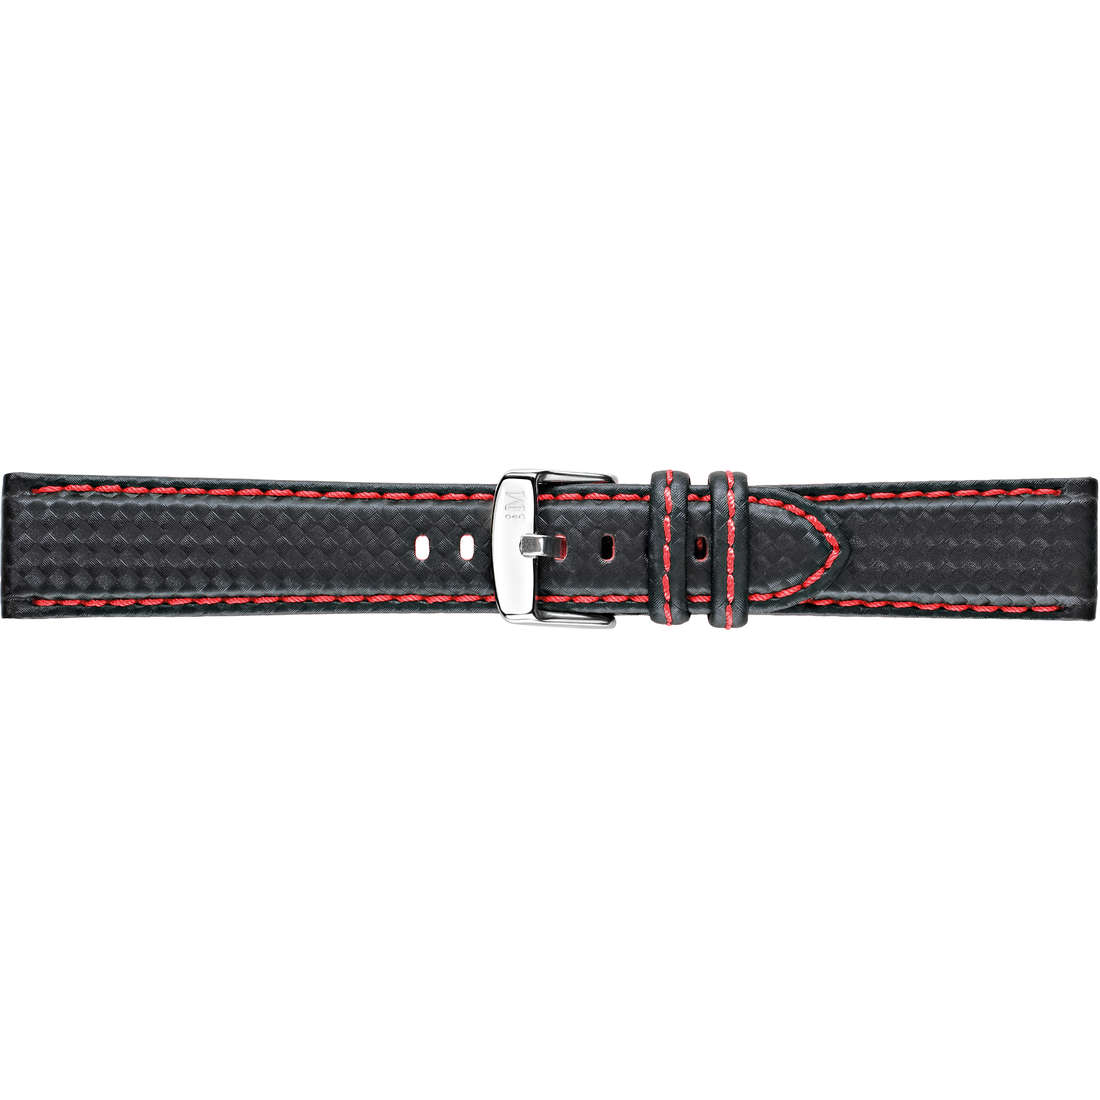 montre bande de montres homme Morellato Linea Sport A01U3586977883CR18